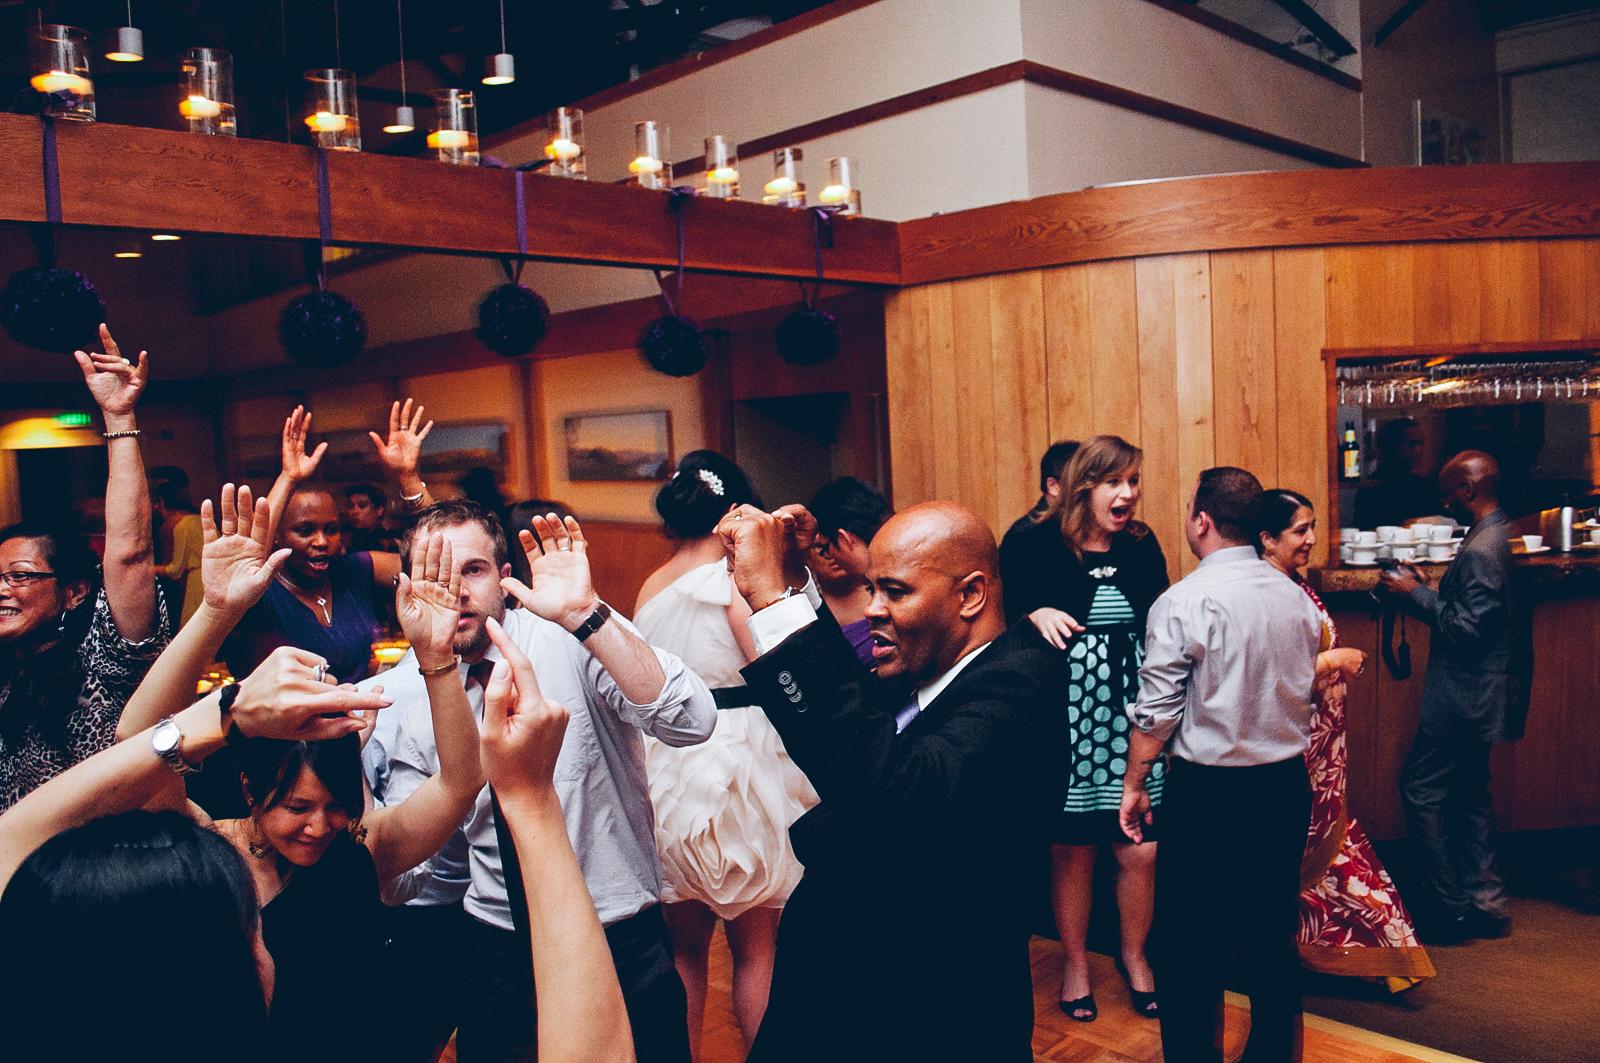 greens_restaurant_wedding_photography_san_franscisco_ebony_siovhan_bokeh_photography_80.jpg